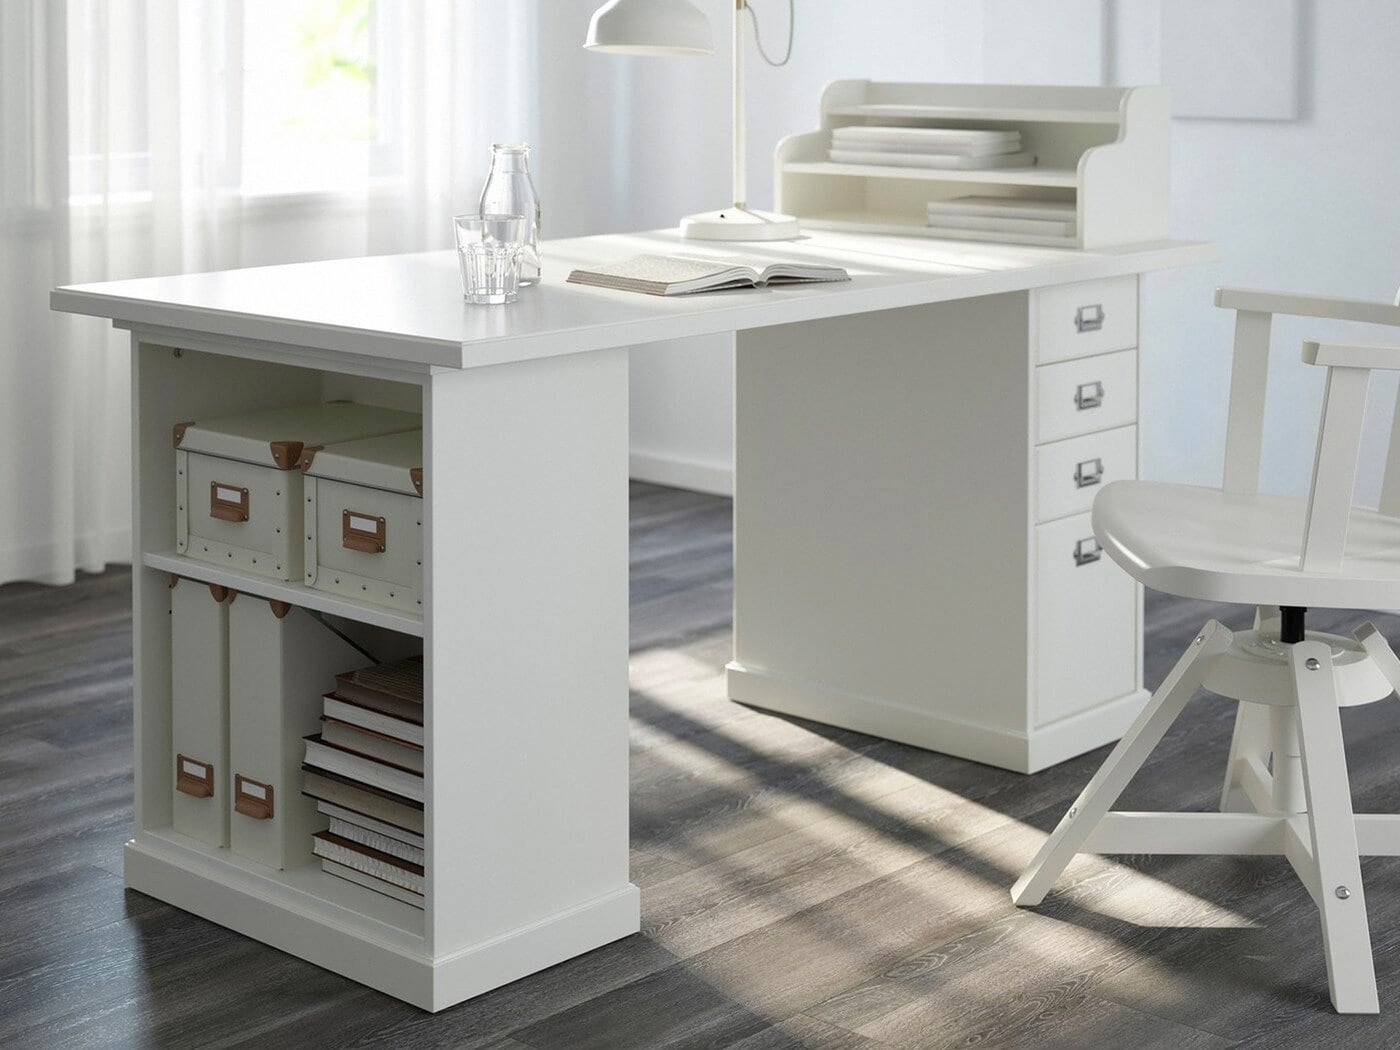 Build your own Desk planner